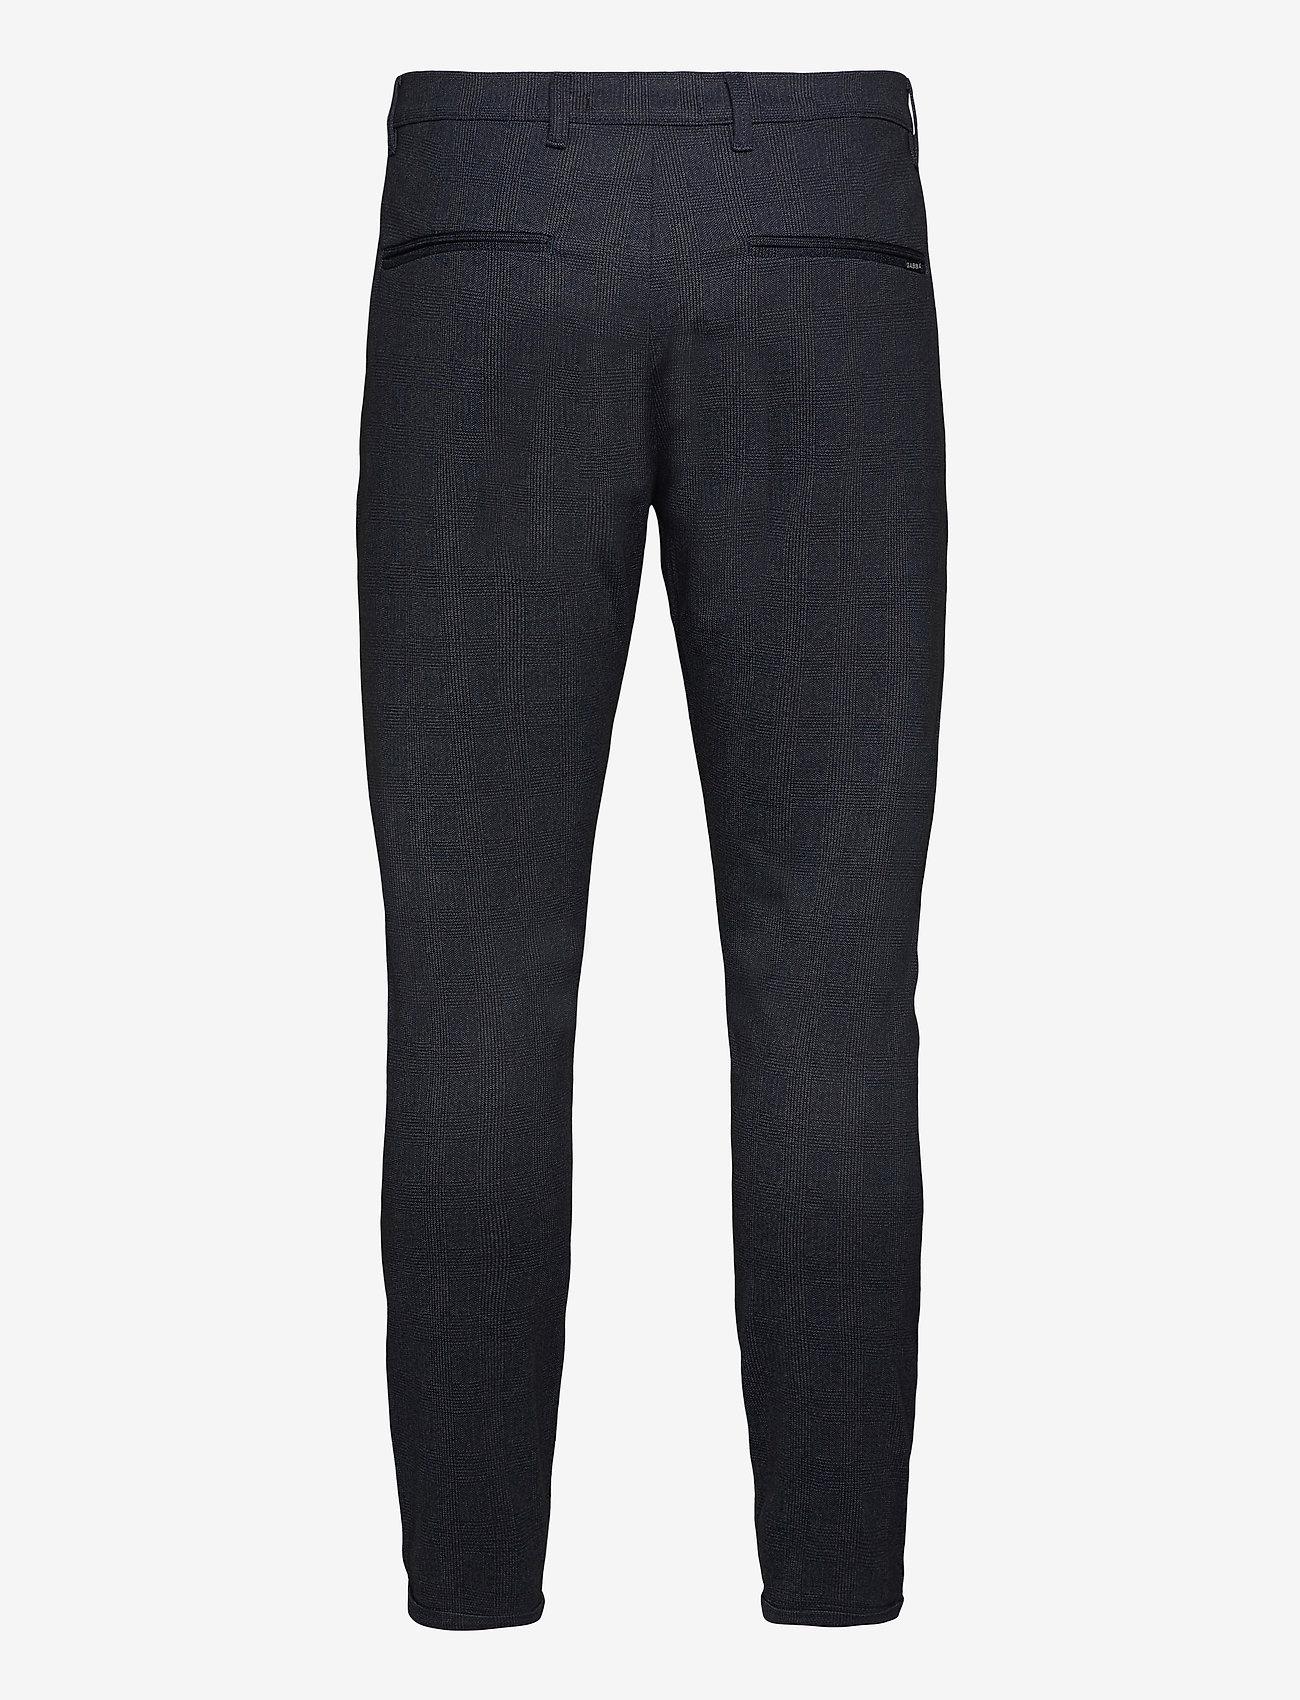 Gabba - Pisa KD3920 Quad Pant - casual - blue check - 1